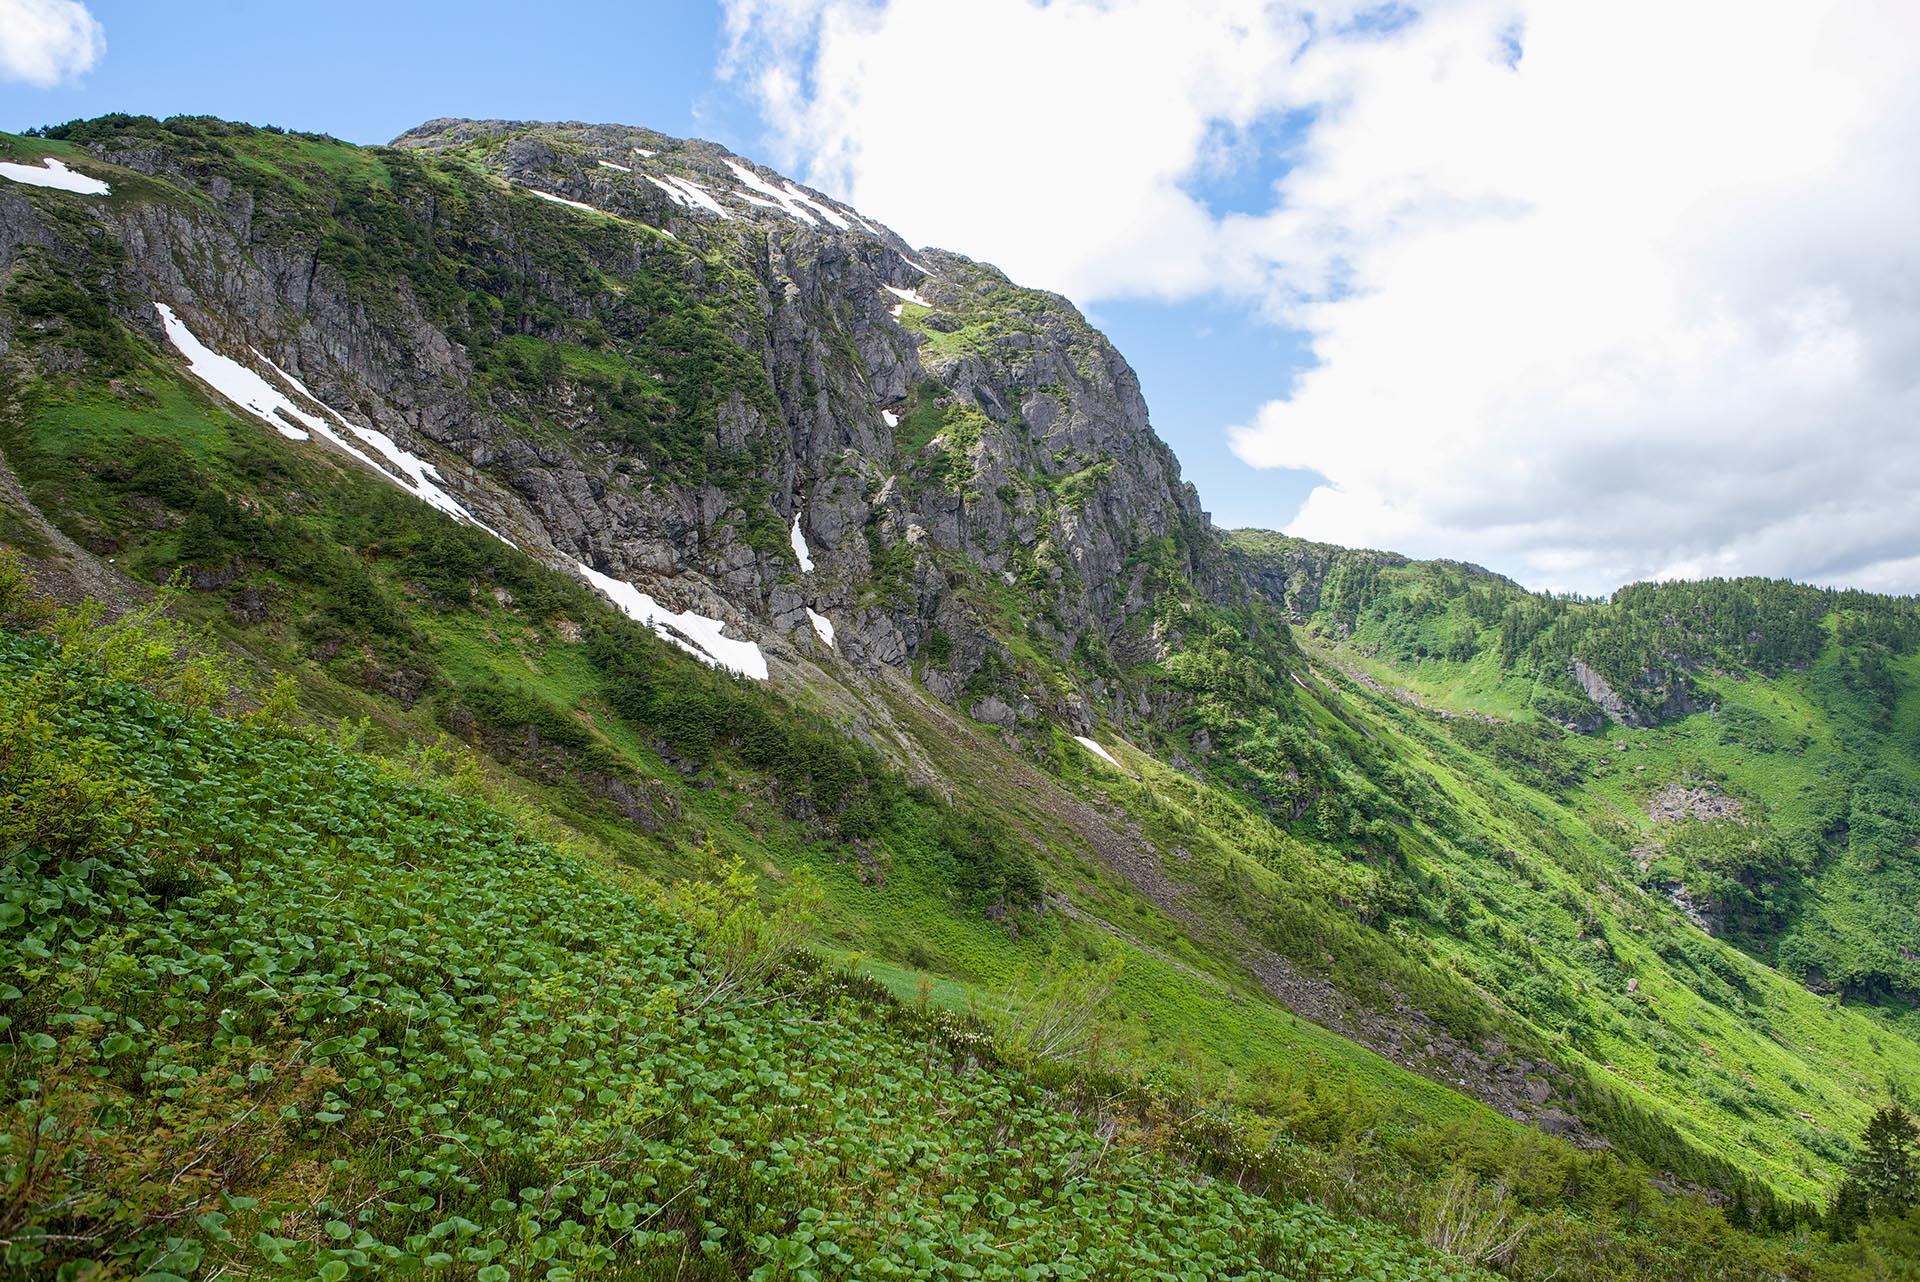 Mt. Jumbo from the ridge.